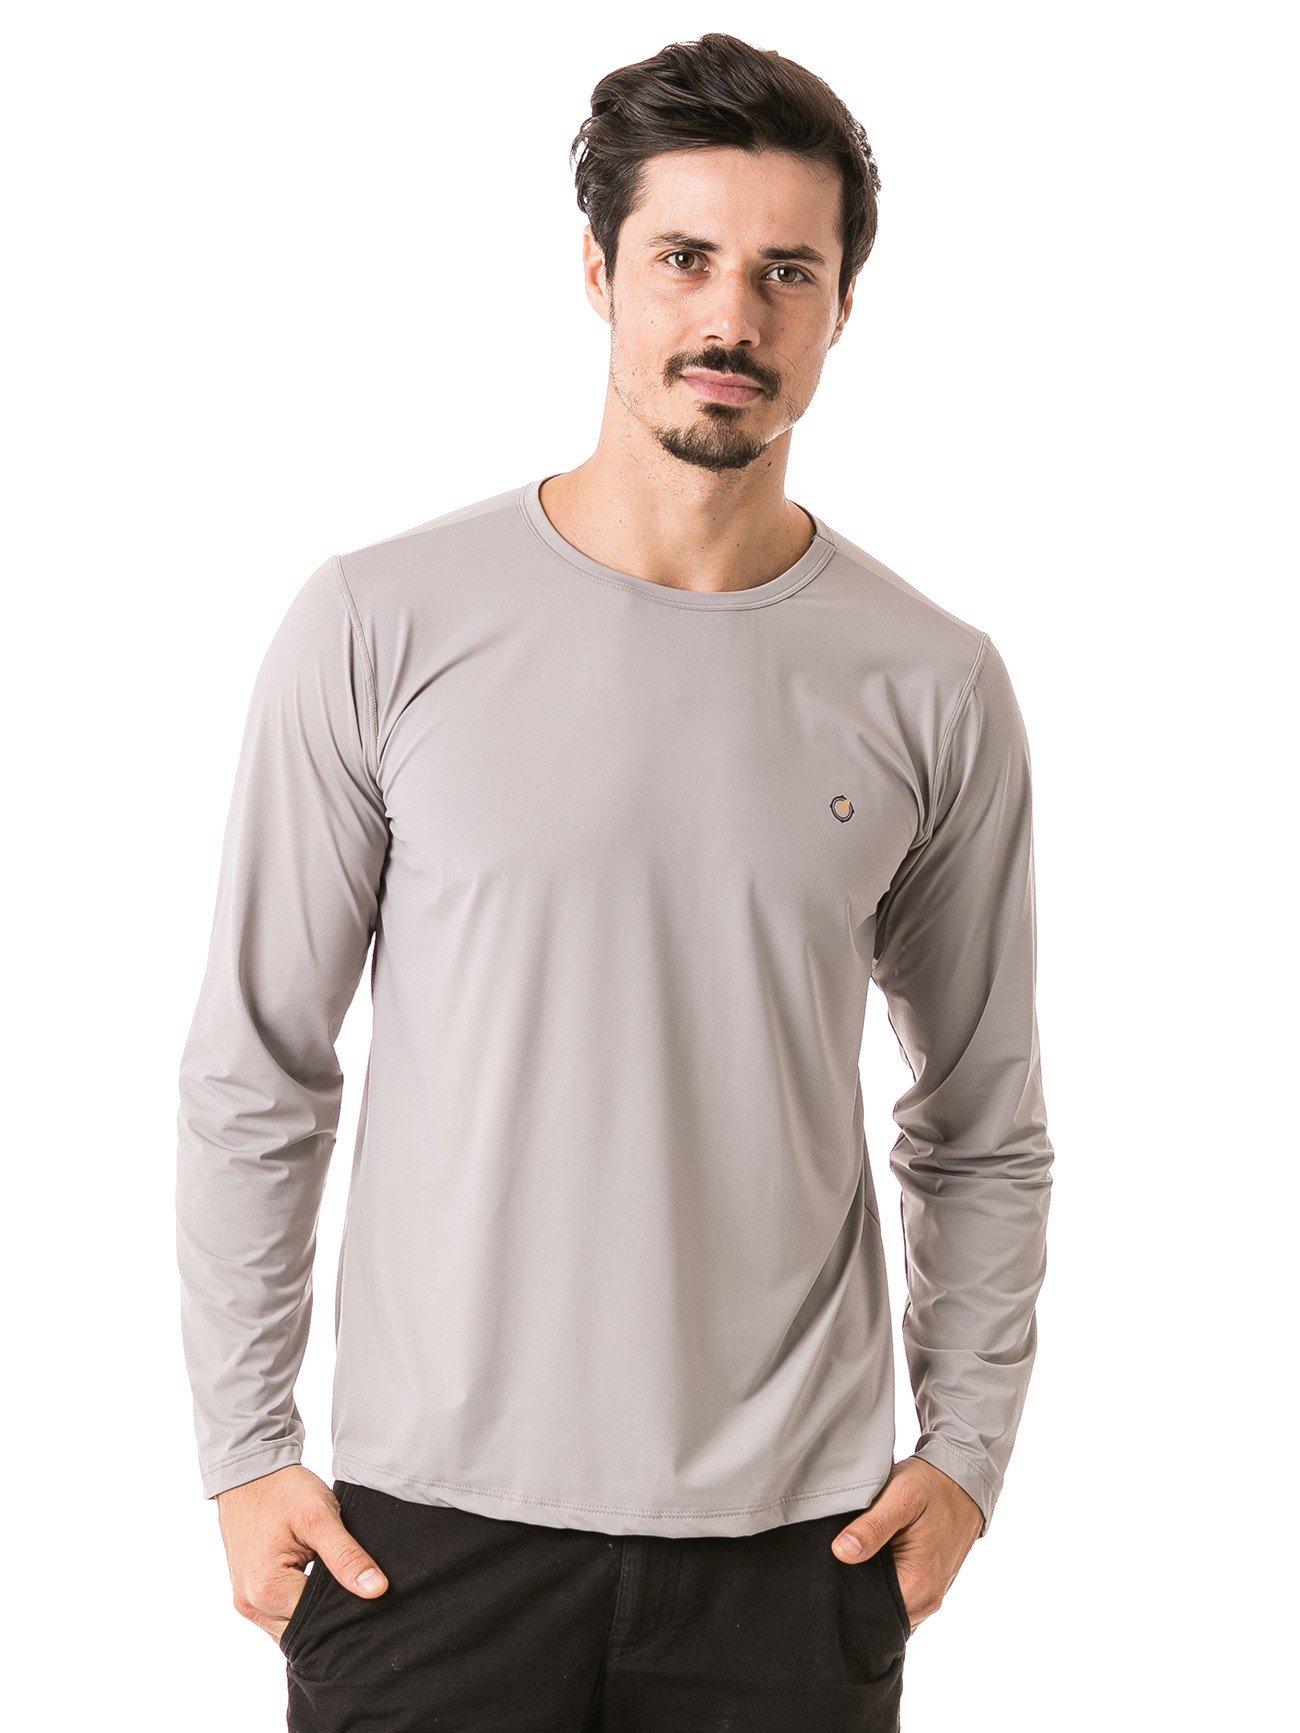 masculina t shirt longa ice cinza frente b